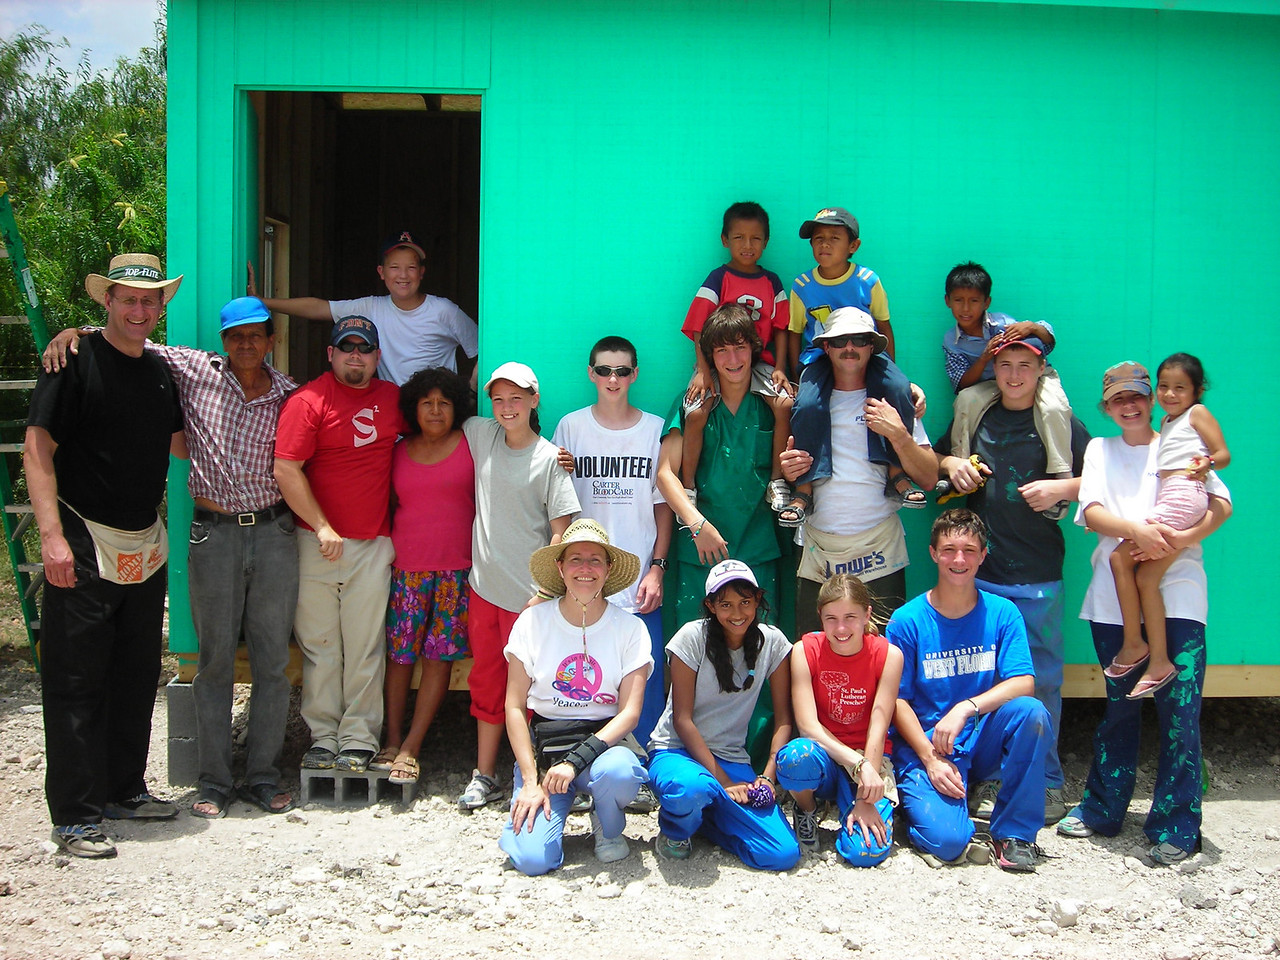 2007-06-21-Mexico-FBCN 014